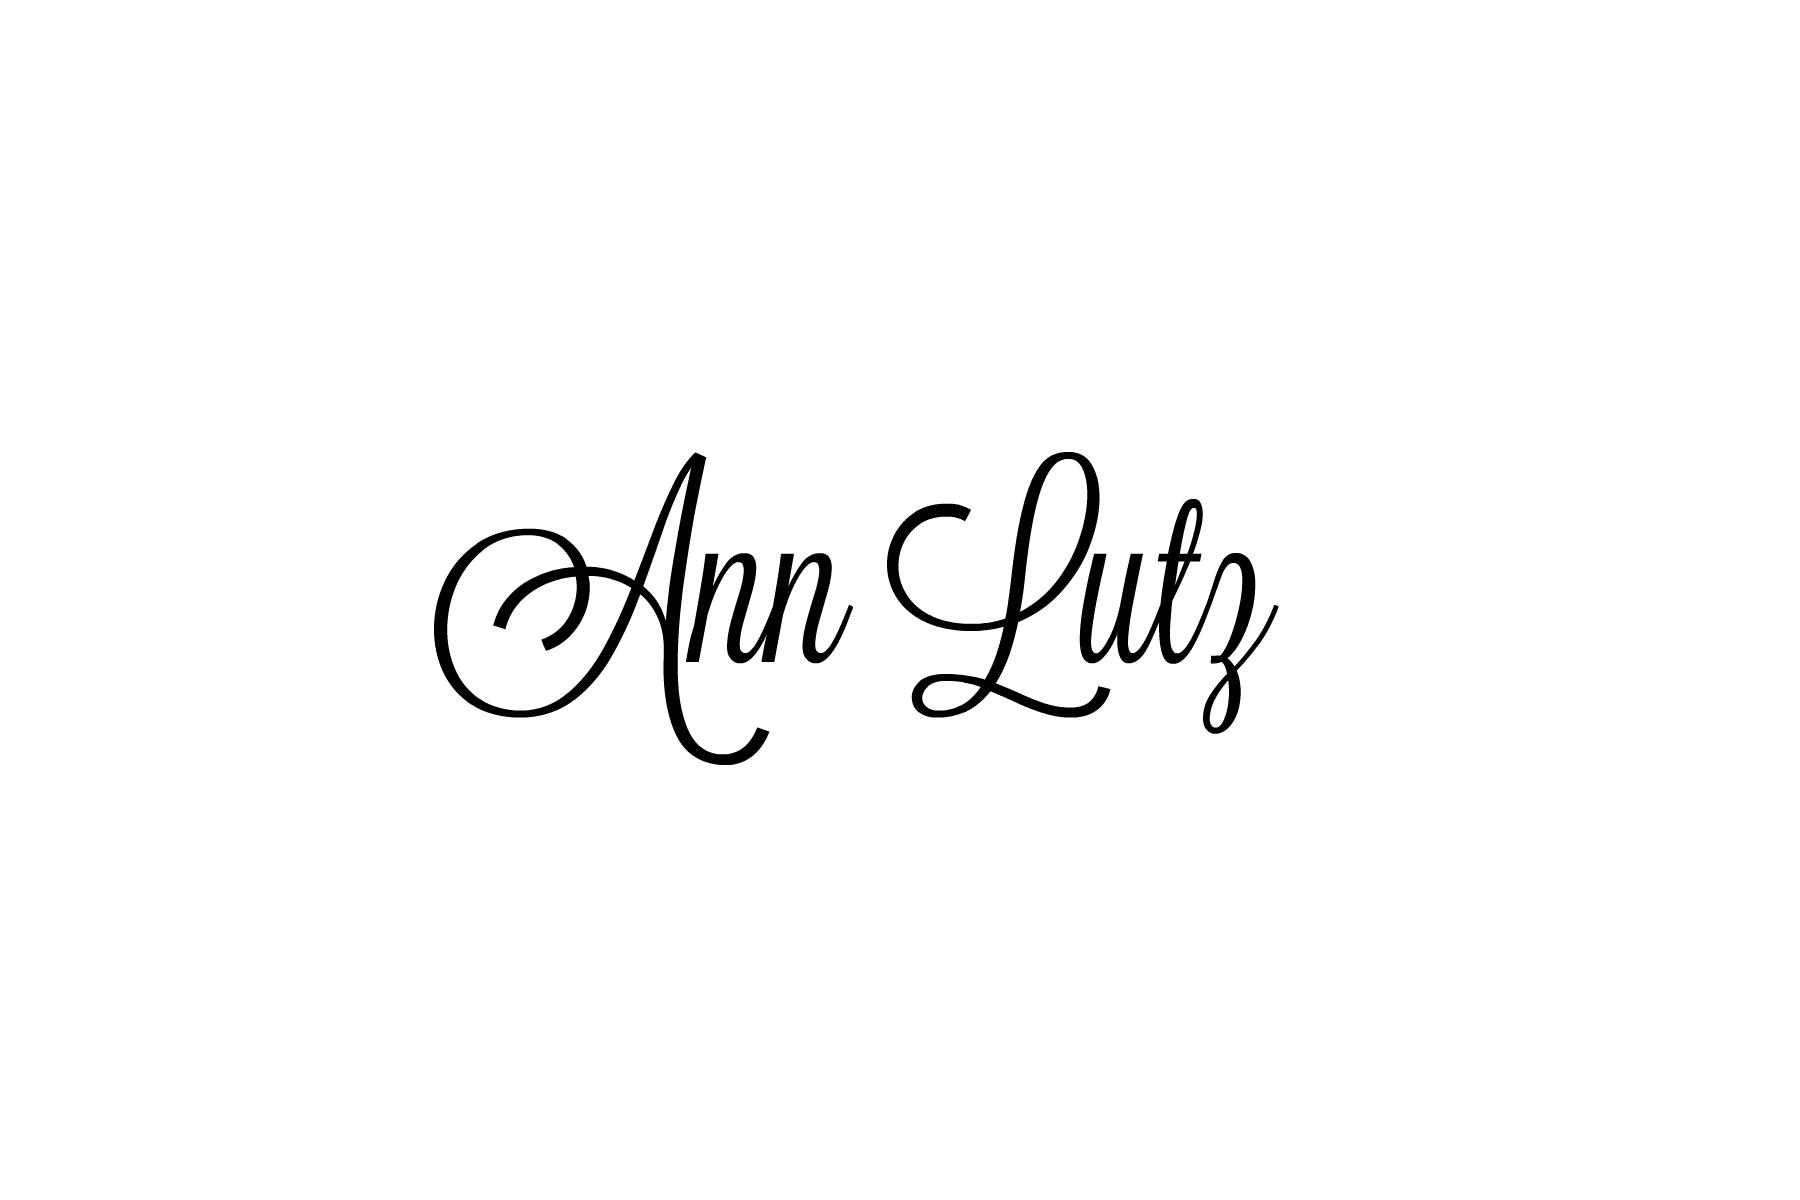 Ann Lutz's Signature